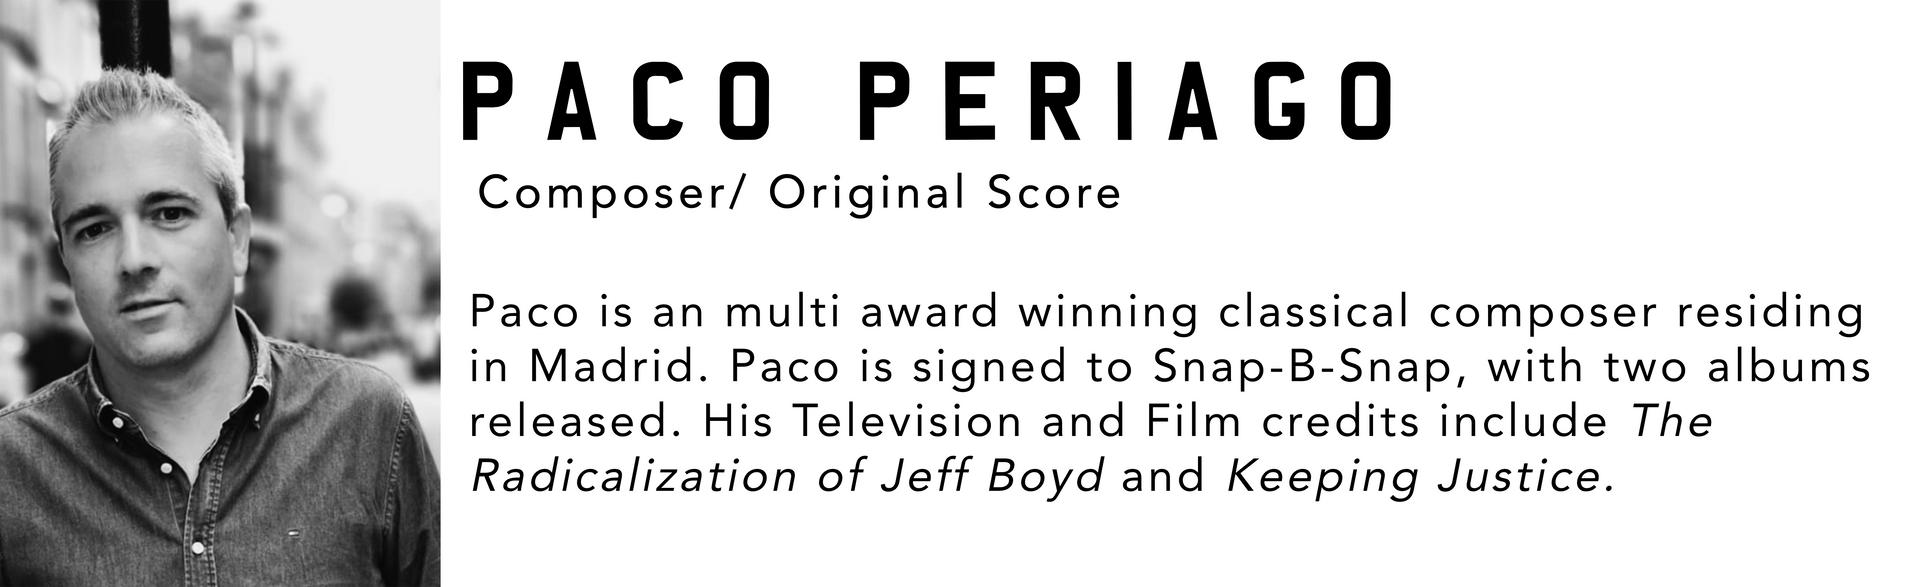 Paco Periago